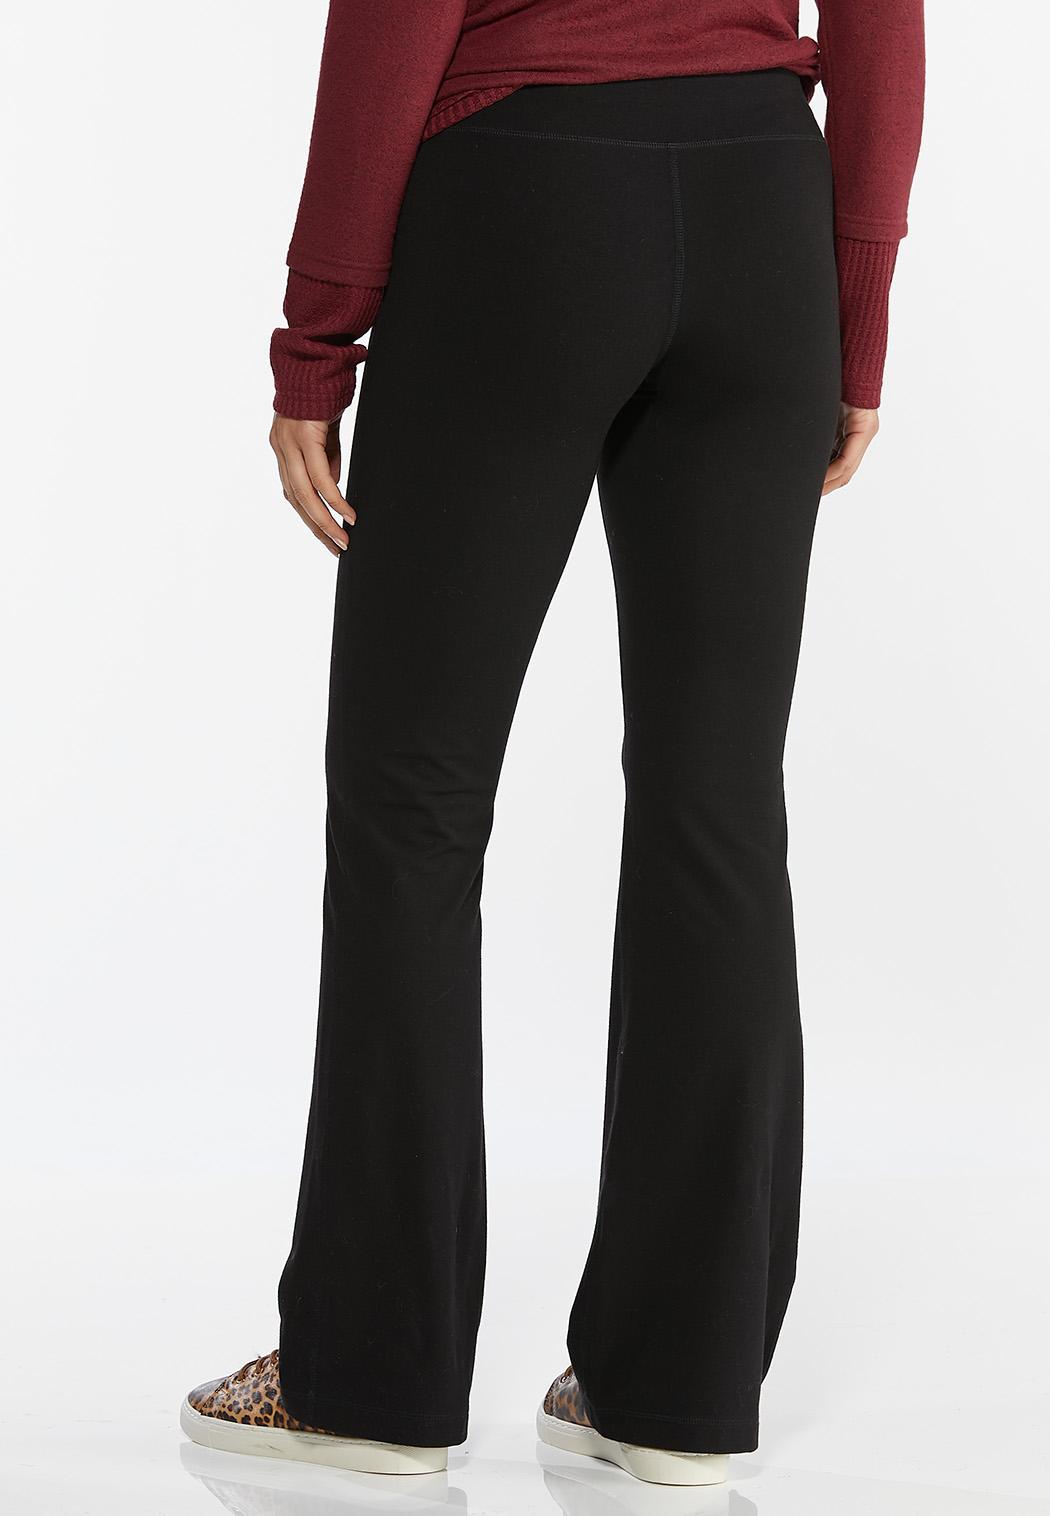 Yoga Pants (Item #44387015)